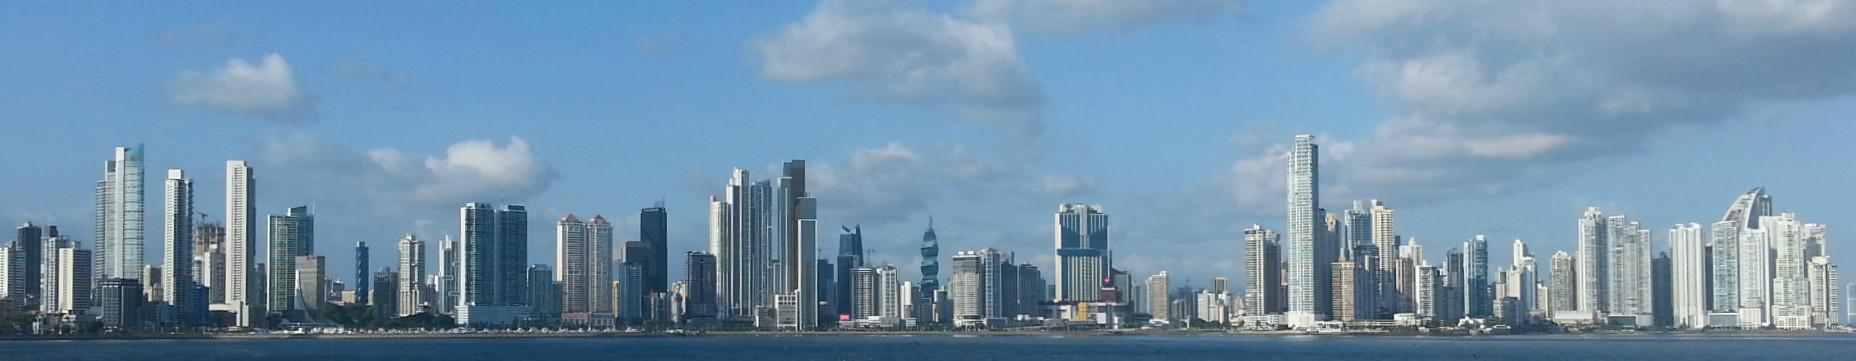 Panama City Skyline 2015